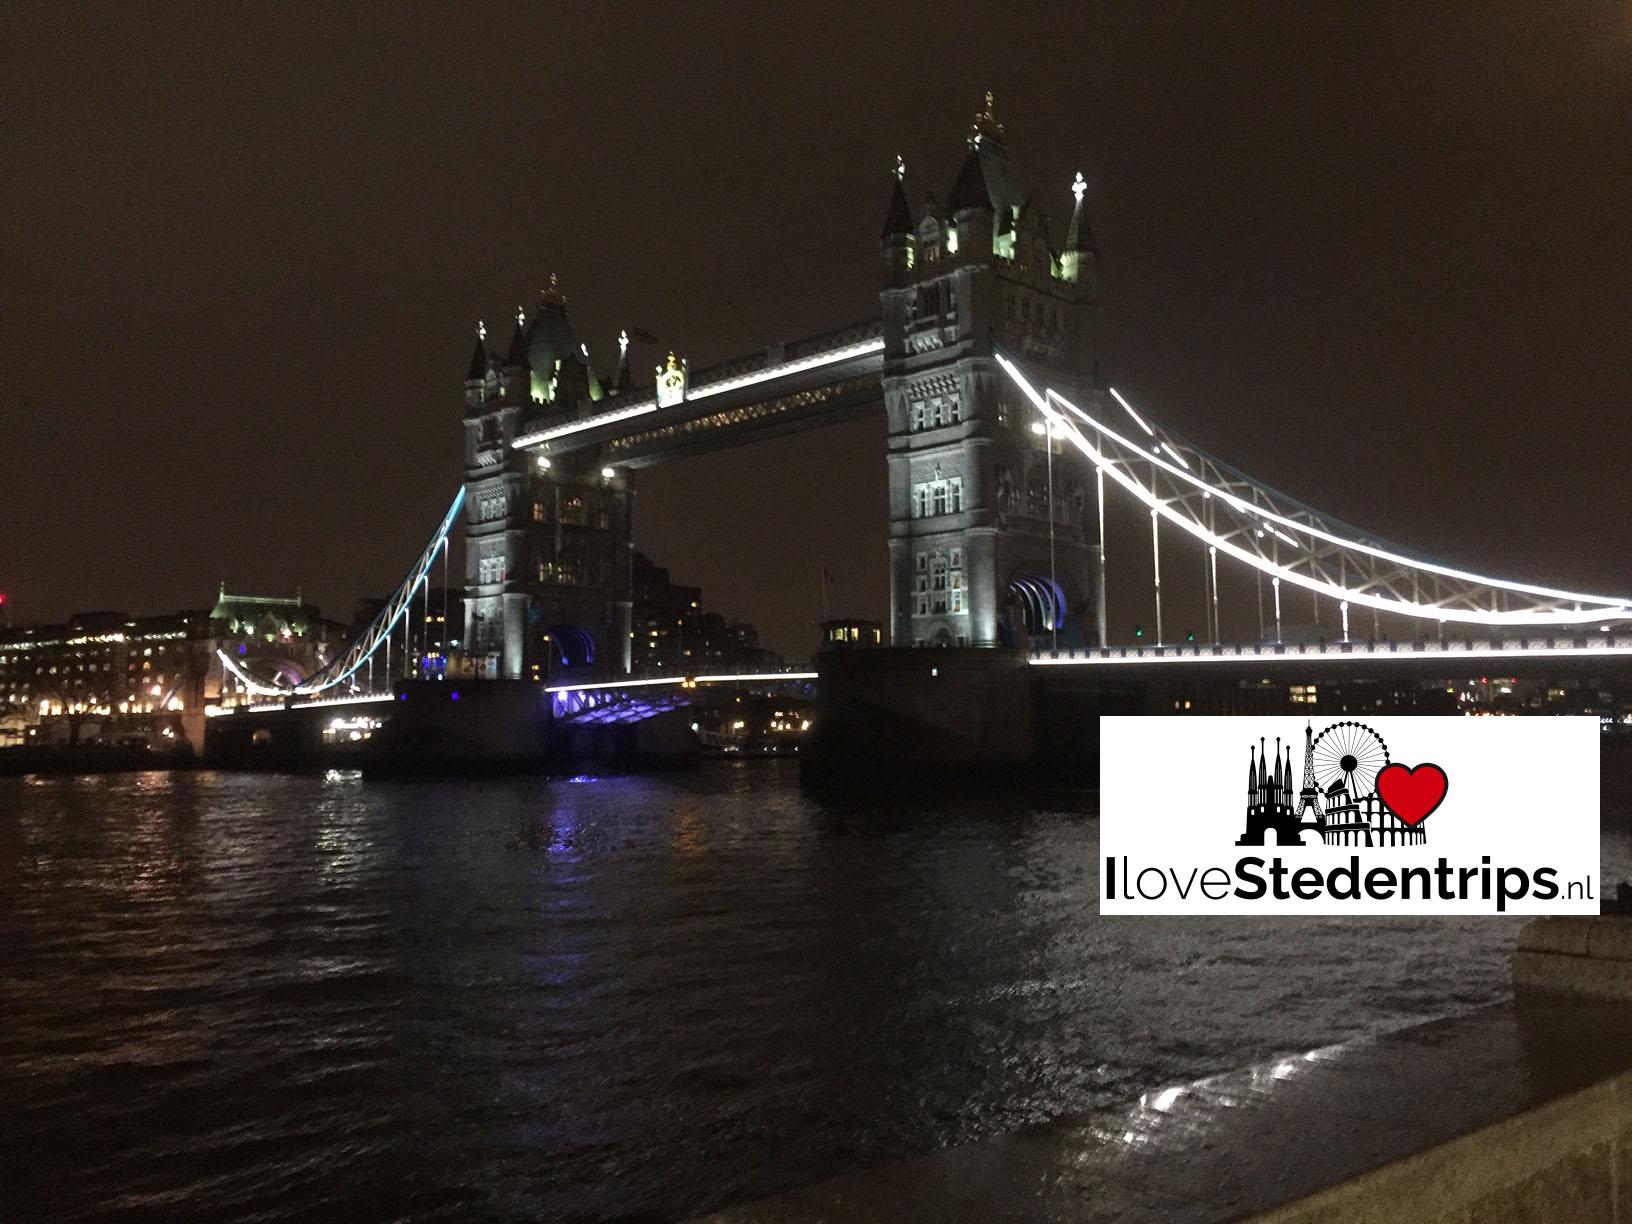 Tower Bridge londen-ilovestedentrips